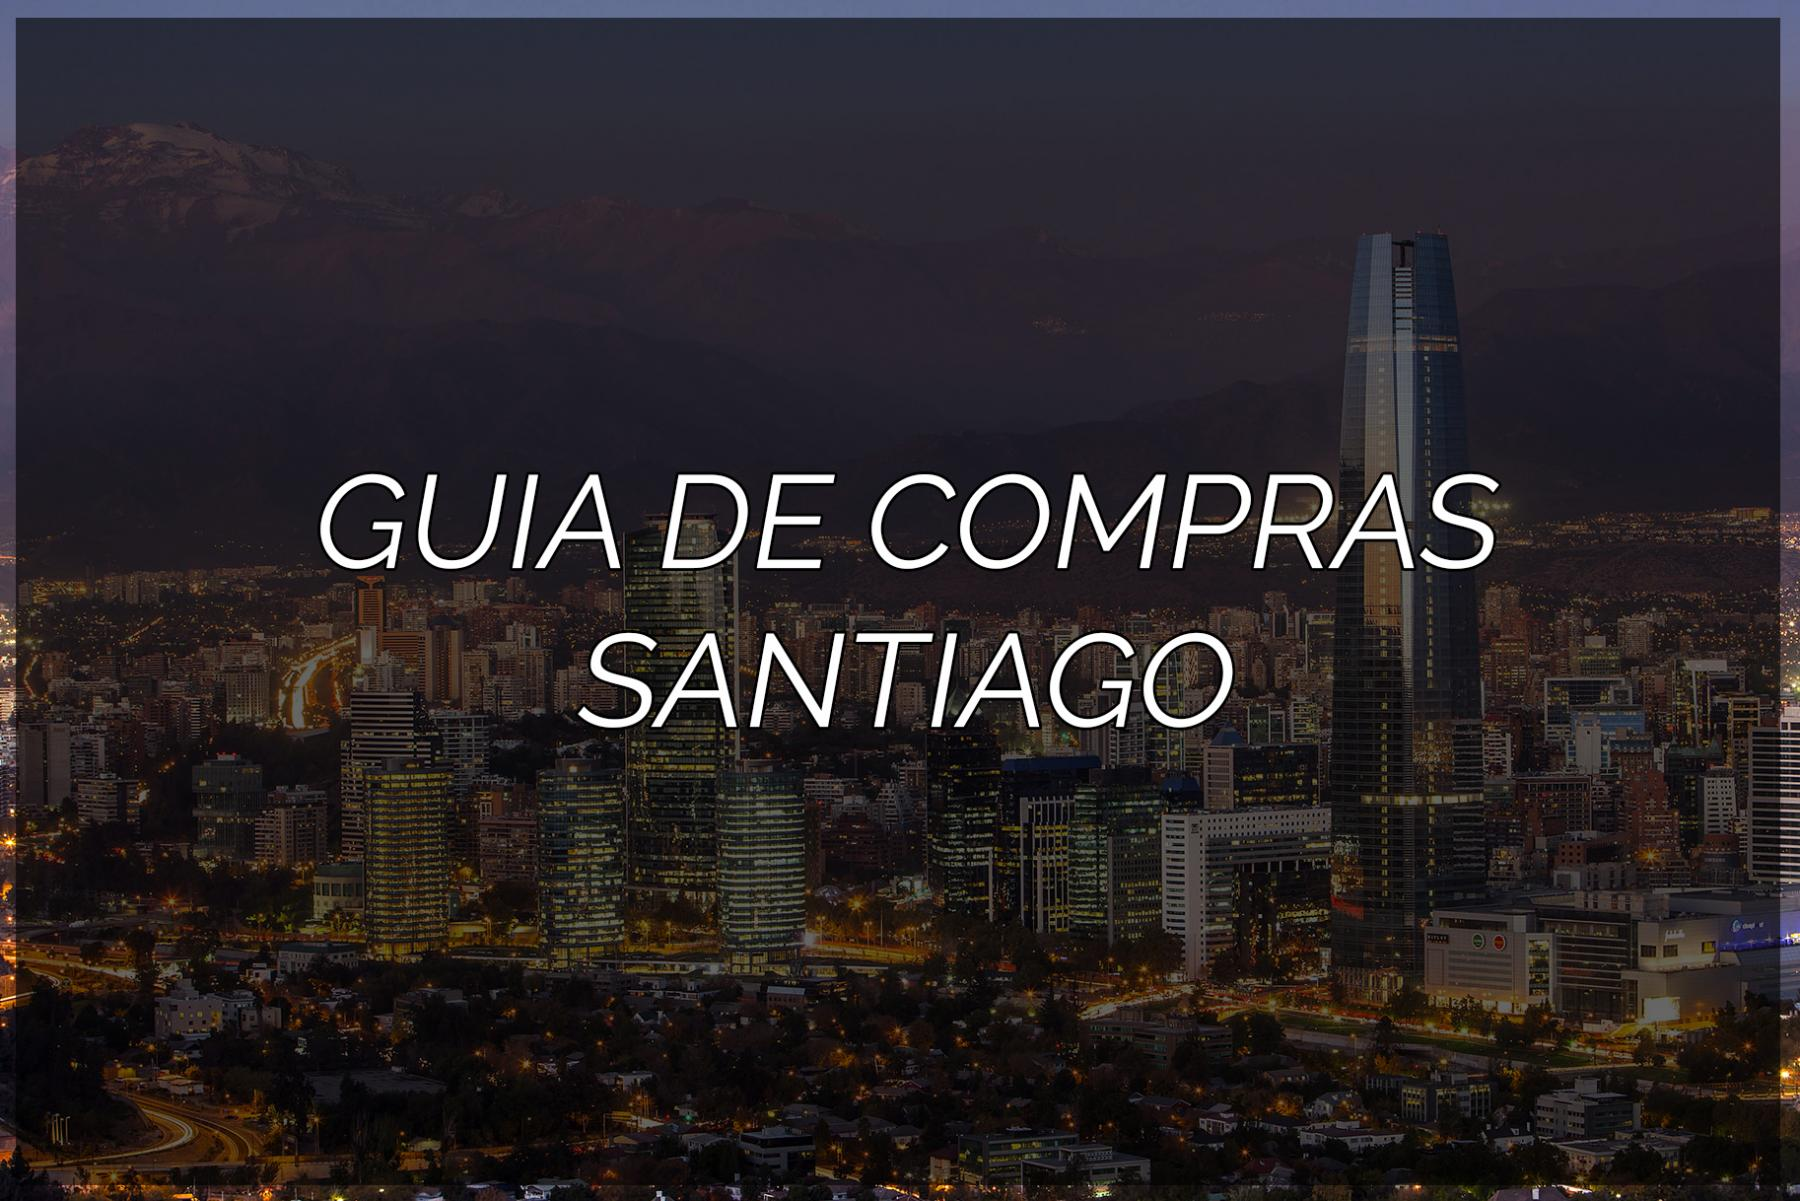 streetwear brasil guia de compras santiago 00 - Pawkier: streetwear bom para cachorro